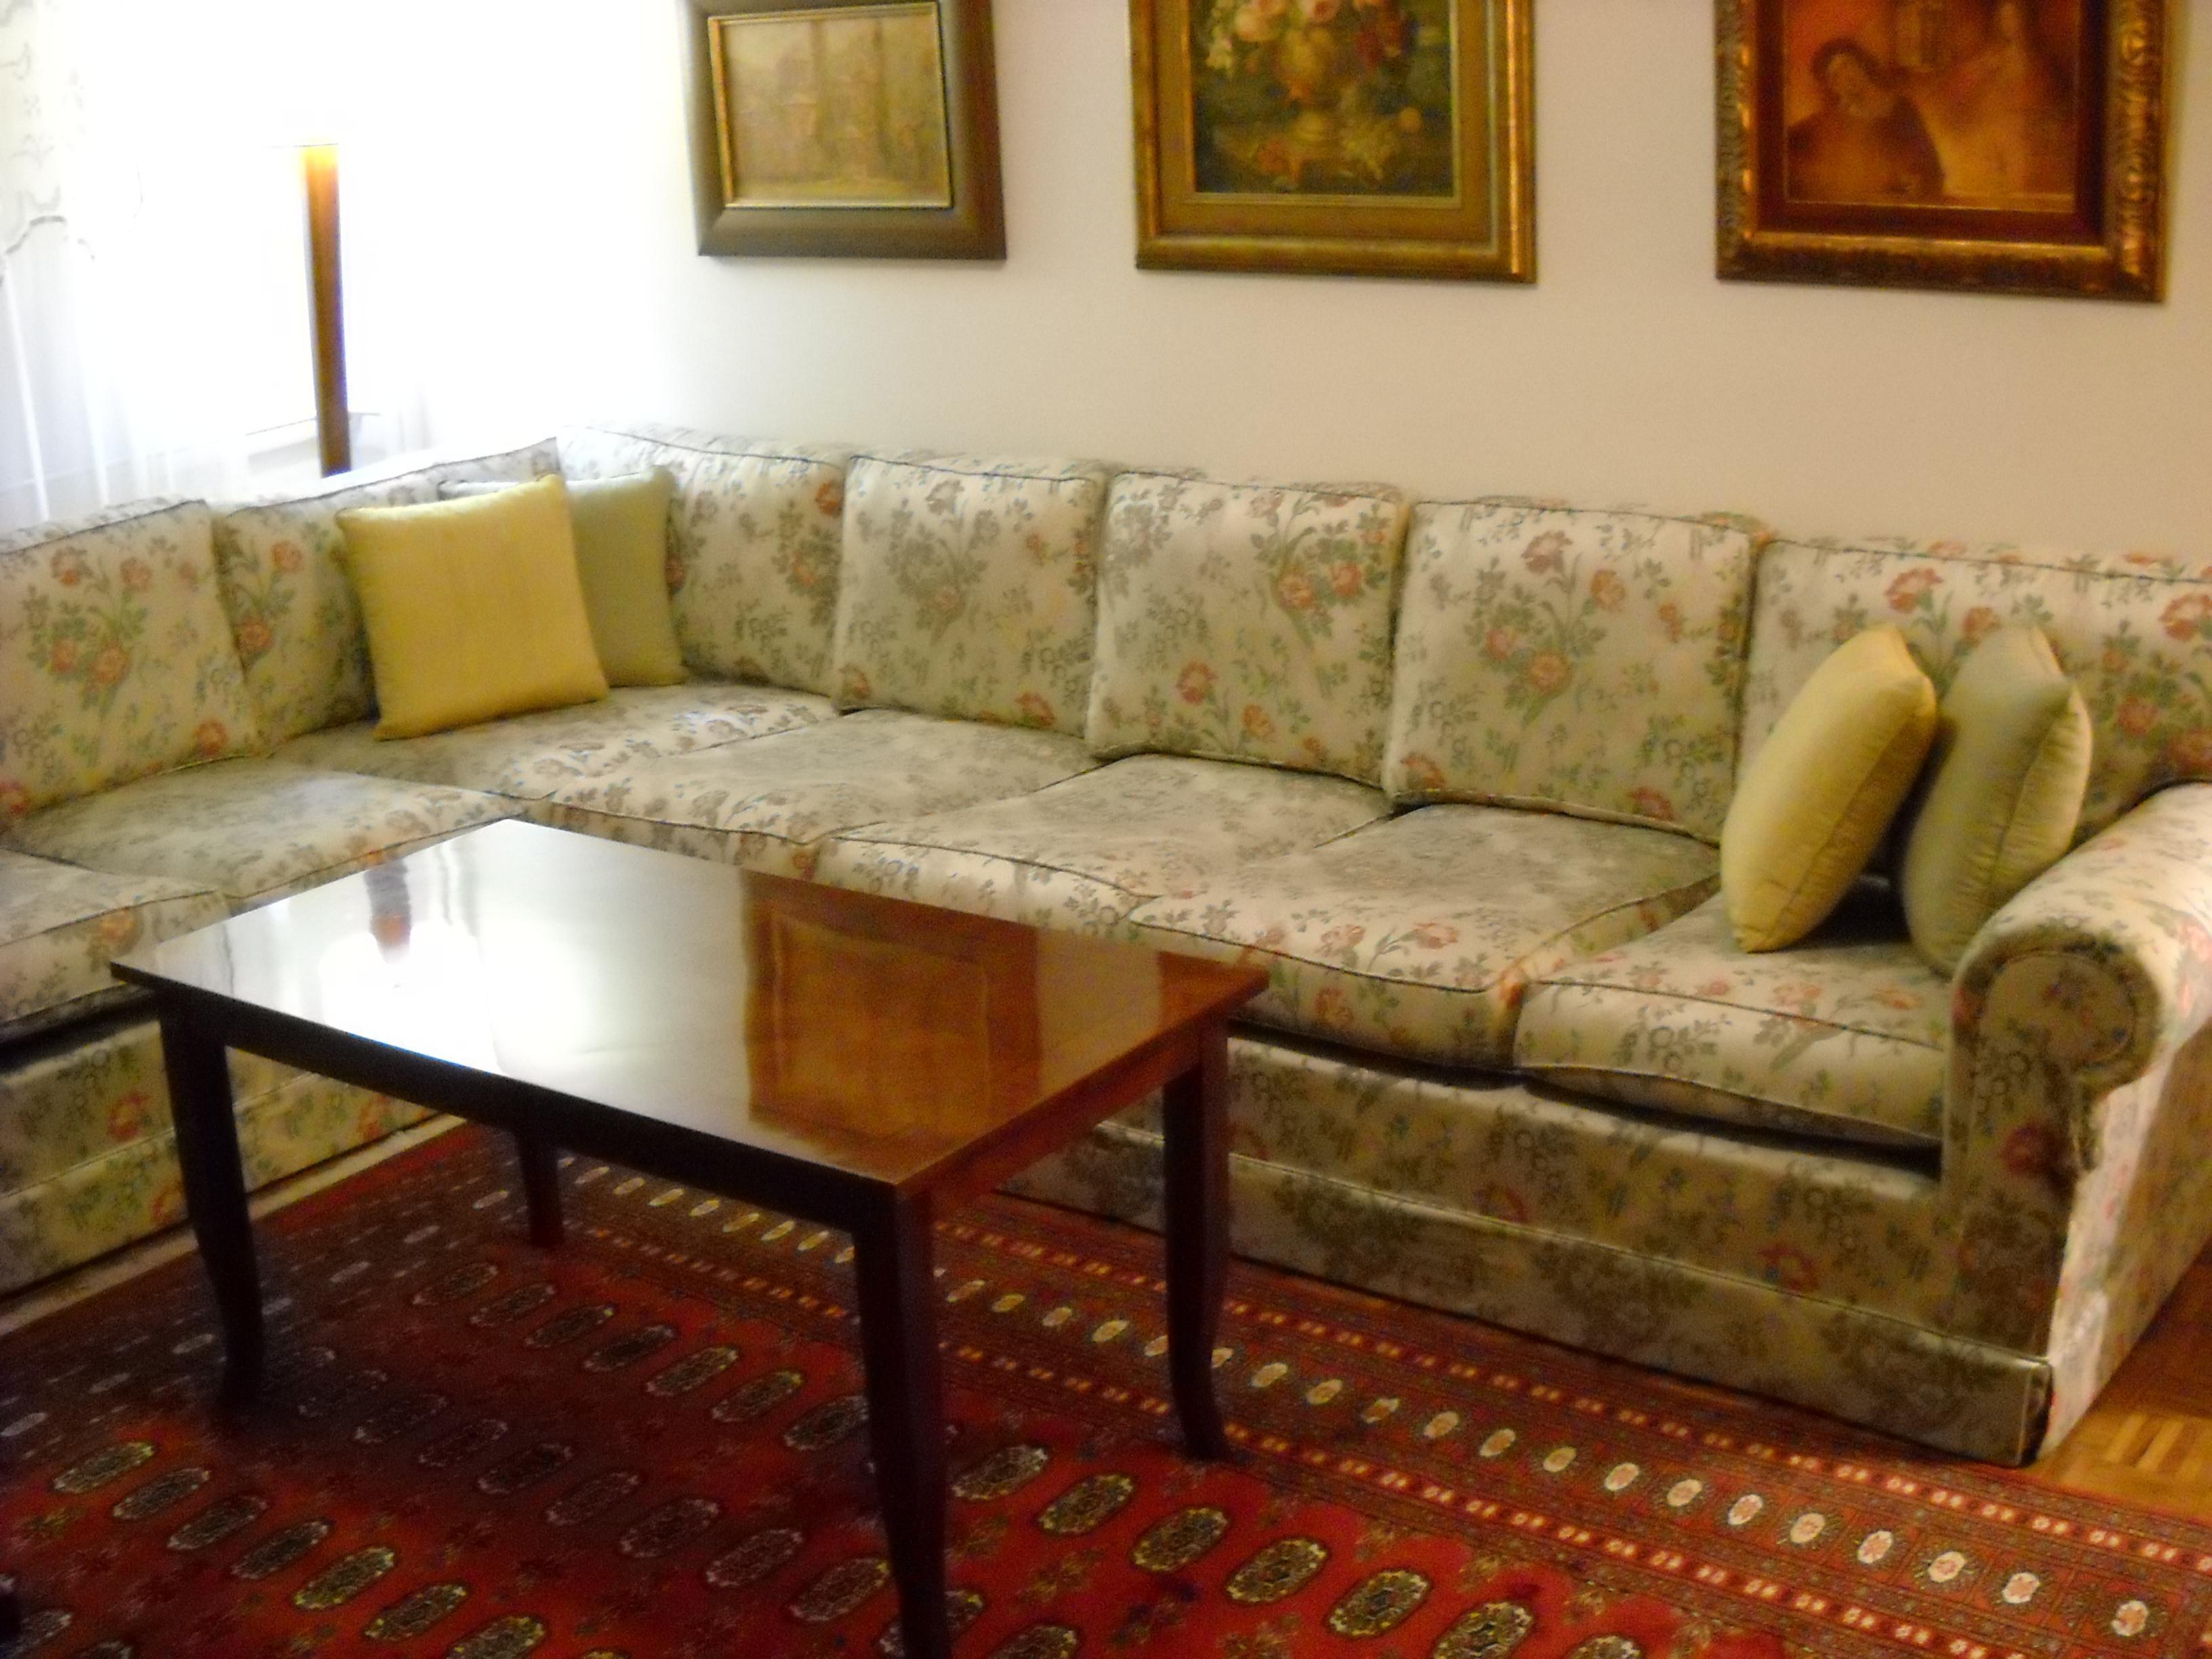 Garniture za dnevne sobe, Tradicionalni, 1 50 komada